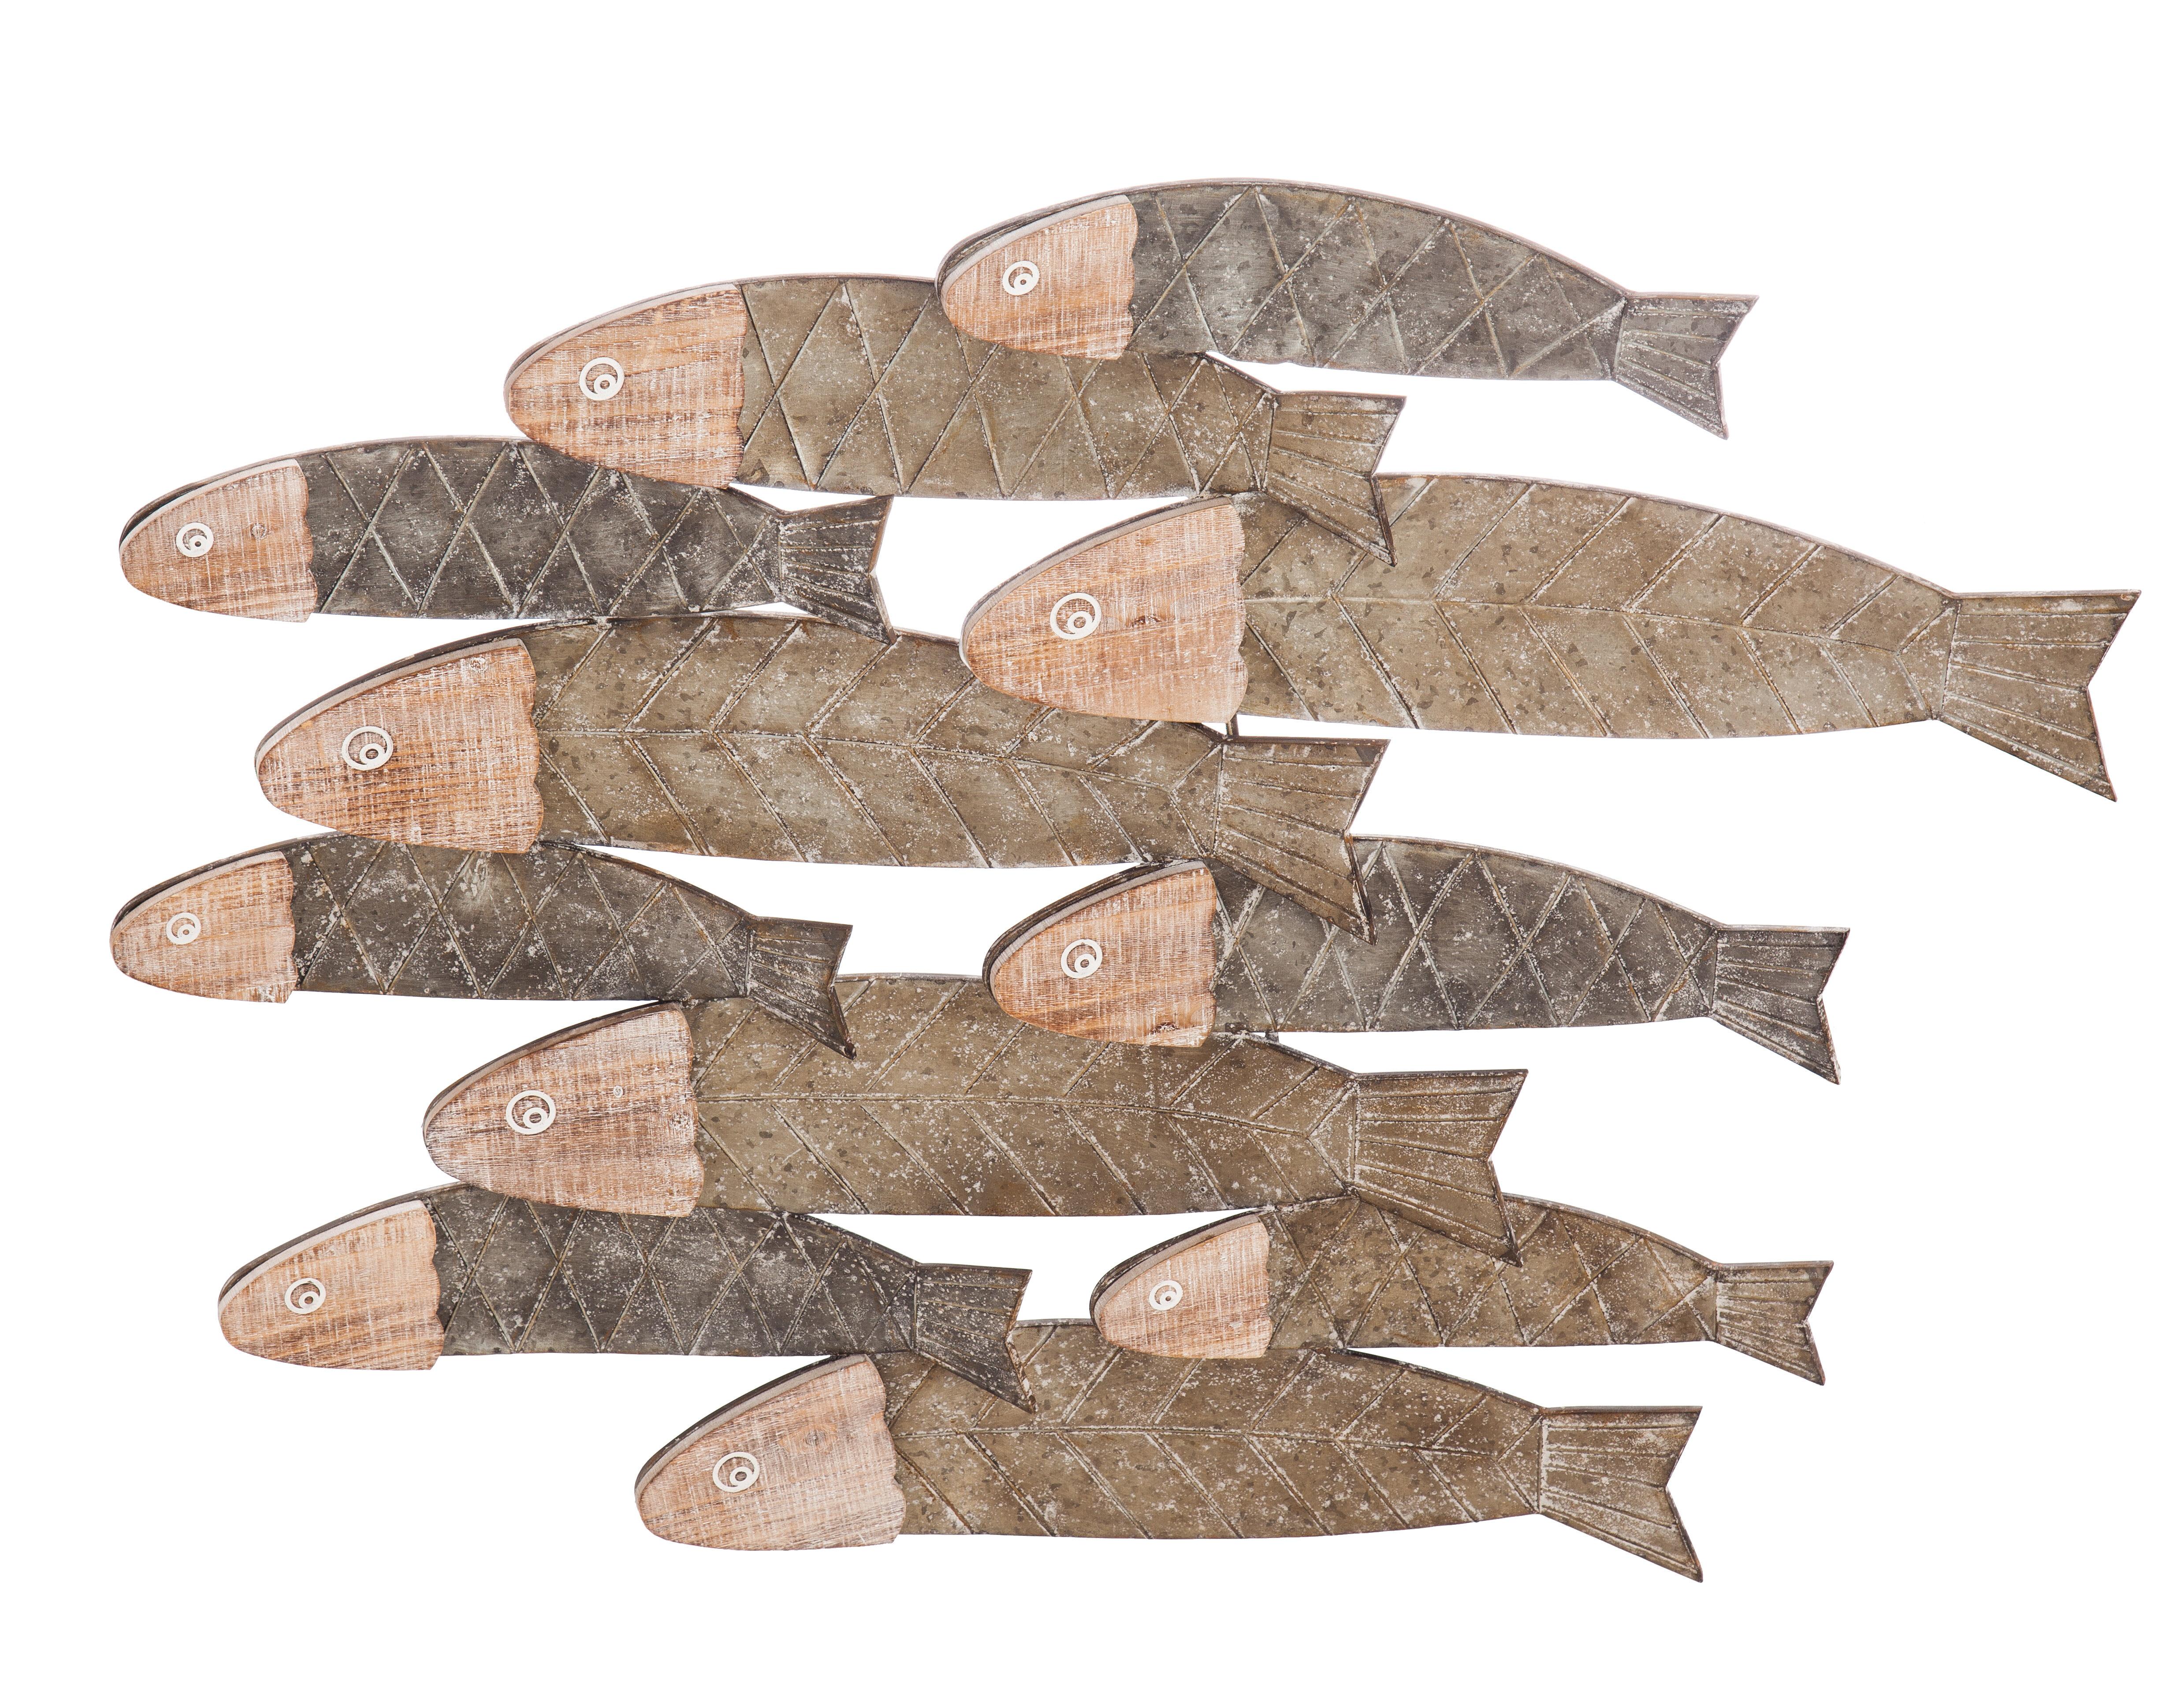 Bay isle home school of fish metal and wood wall décor wayfair